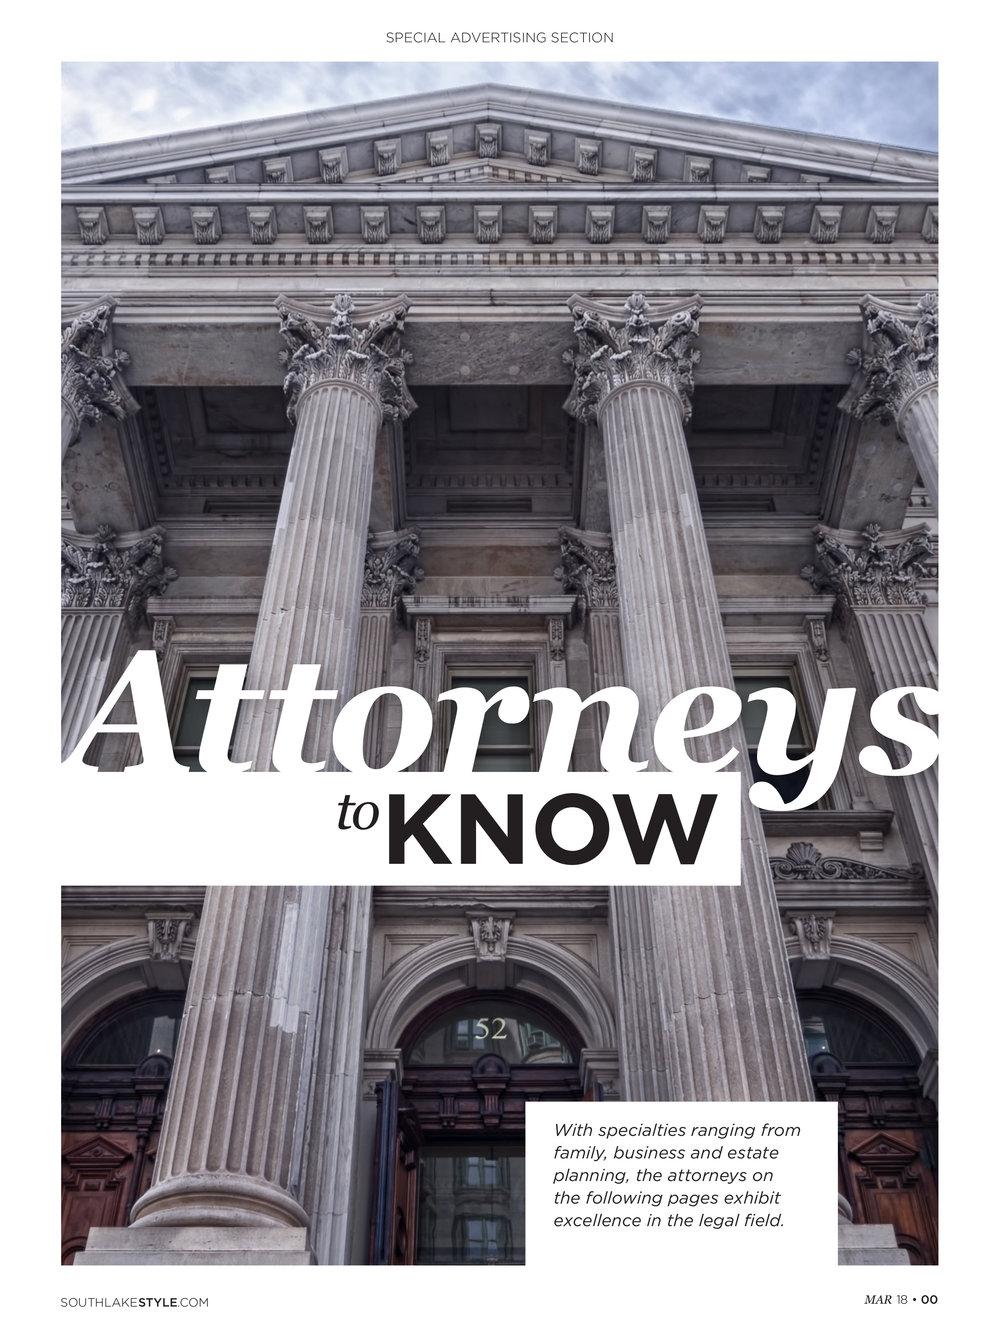 AttorneysToKnow_2018-1.jpg